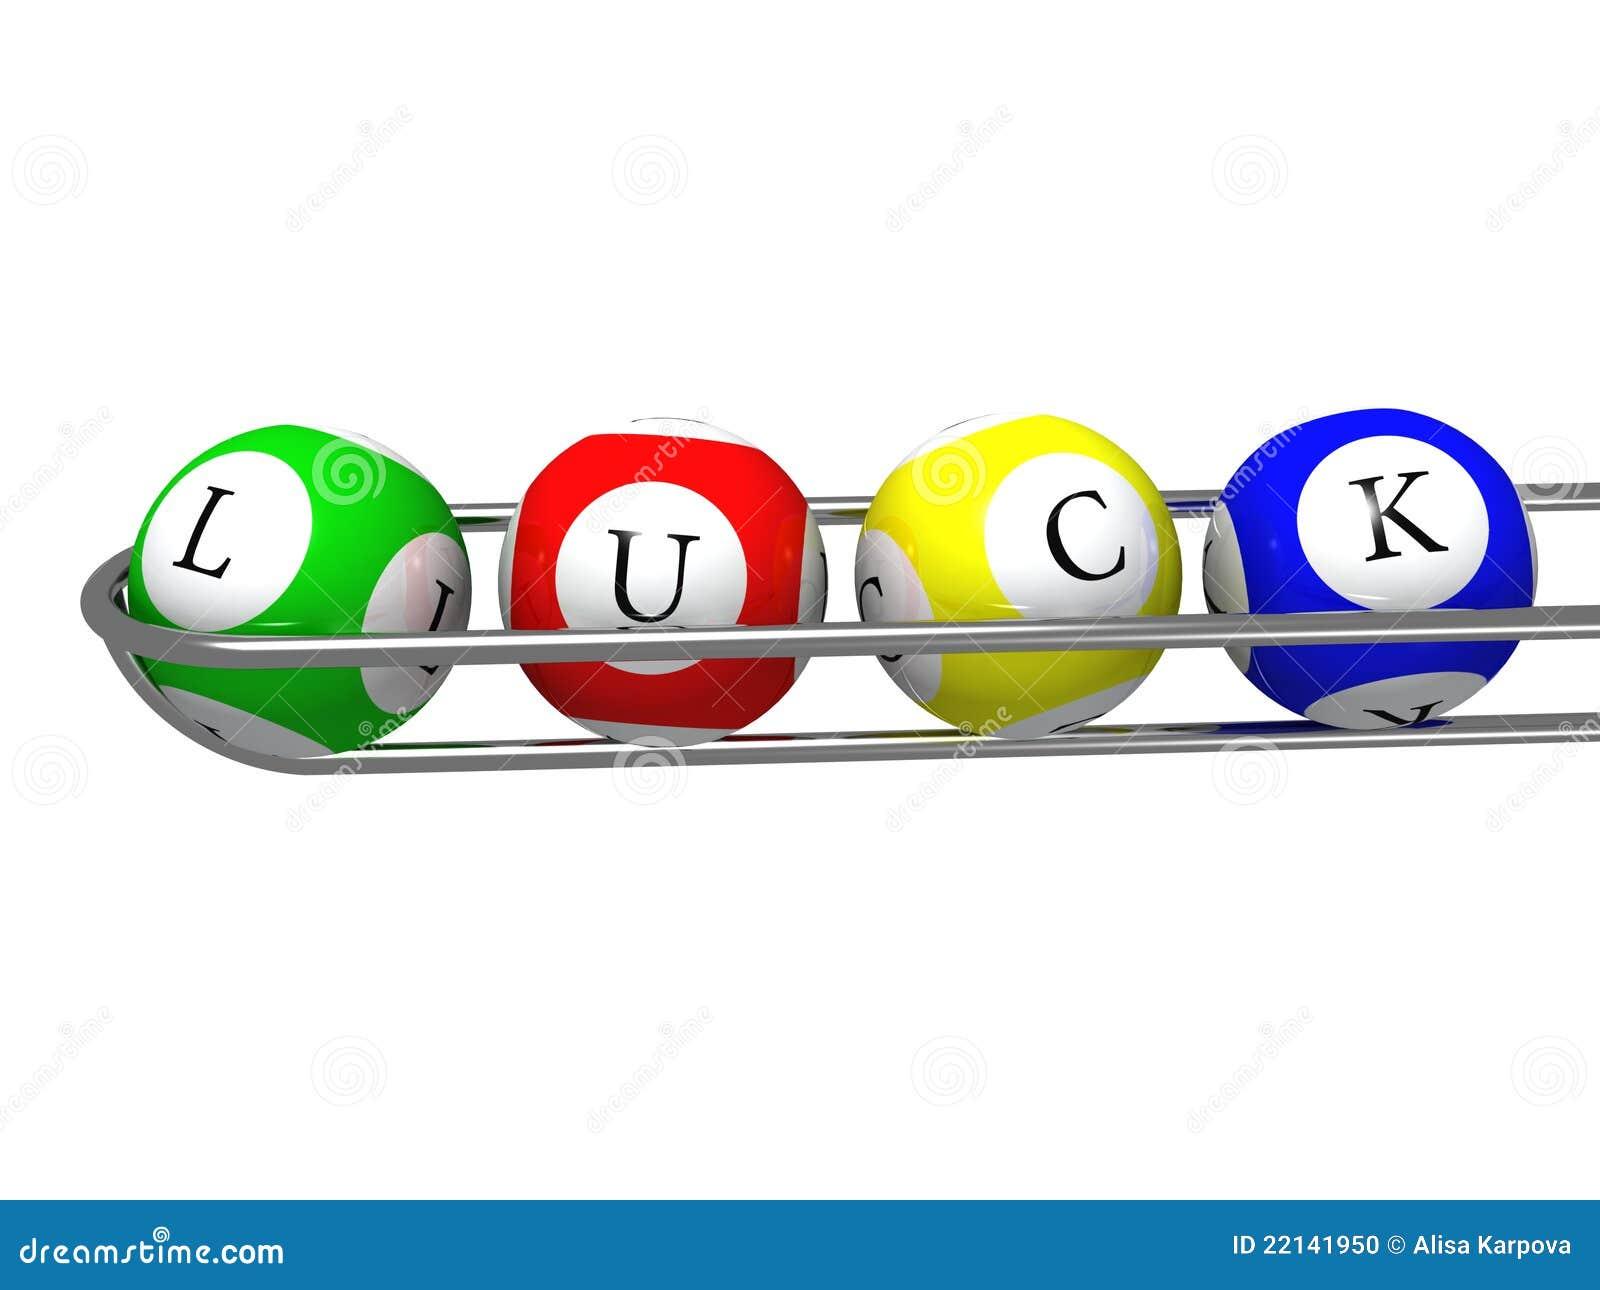 Bingo Clip Art Stock Photos, Images, & Pictures - 106 Images